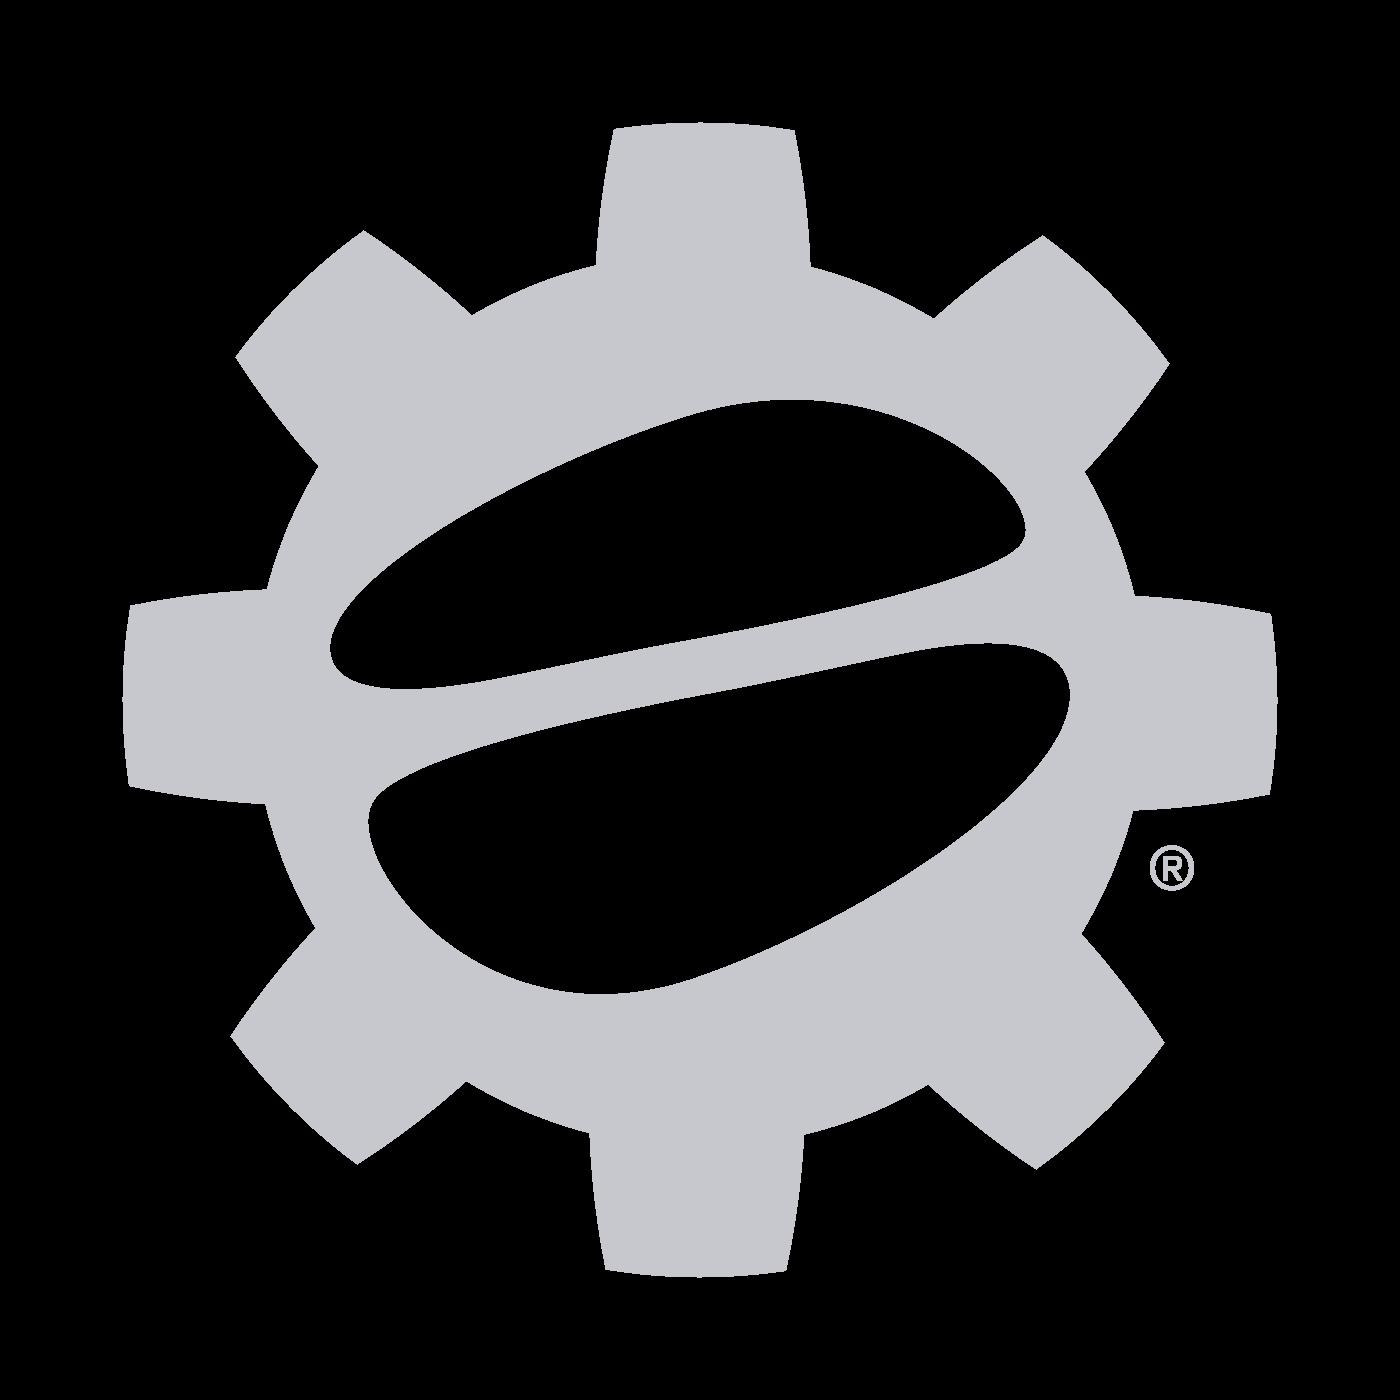 Intelligentsia Coffee Black Cat Classic Espresso - 12oz